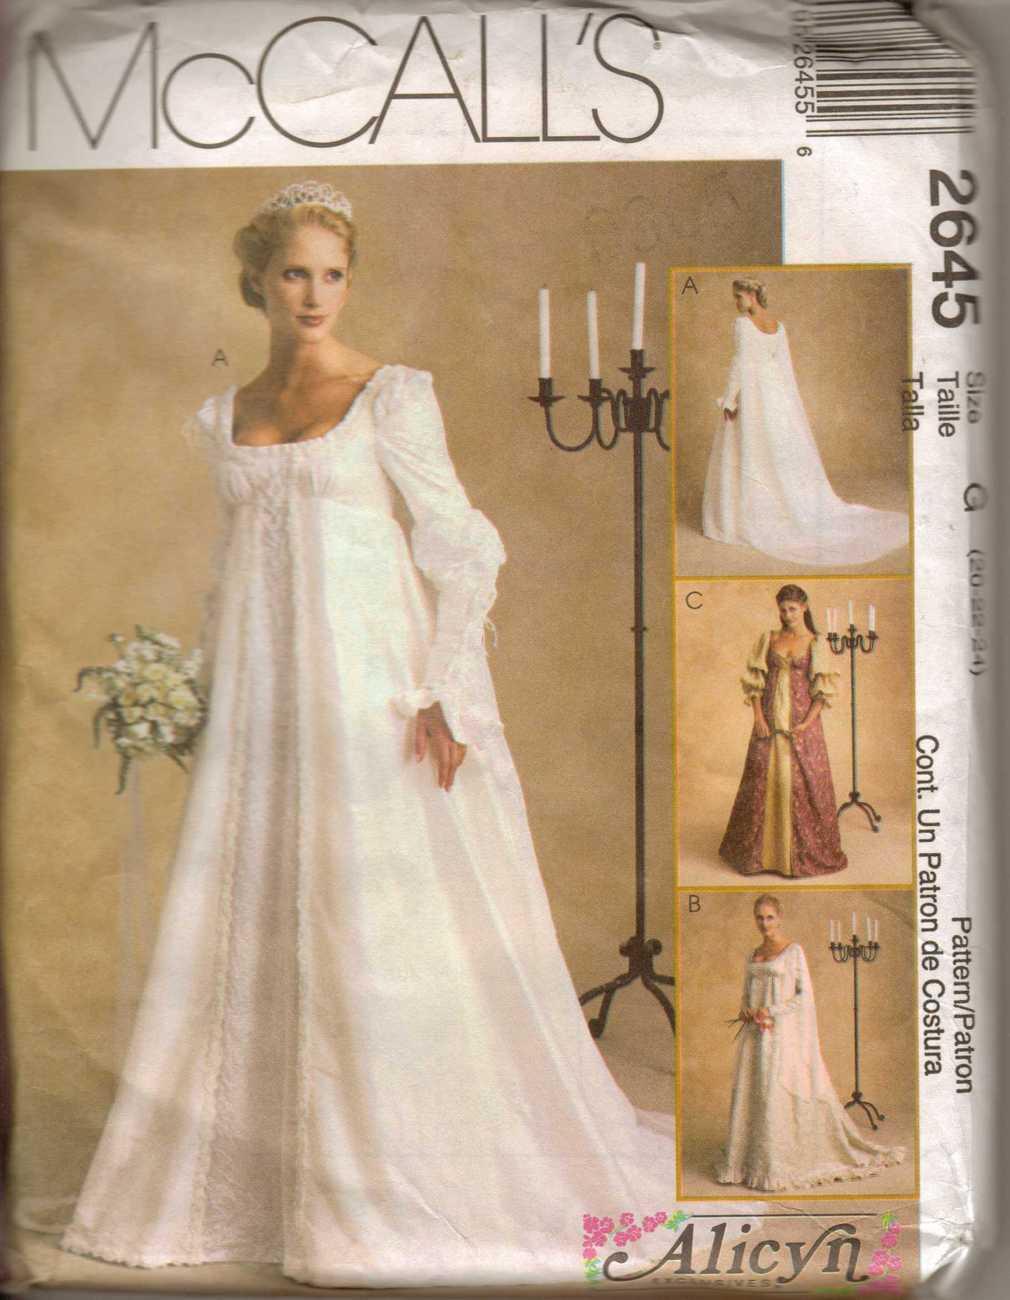 Misses Medieval Wedding Dress McCalls 2645 20 24 Sewing Patterns